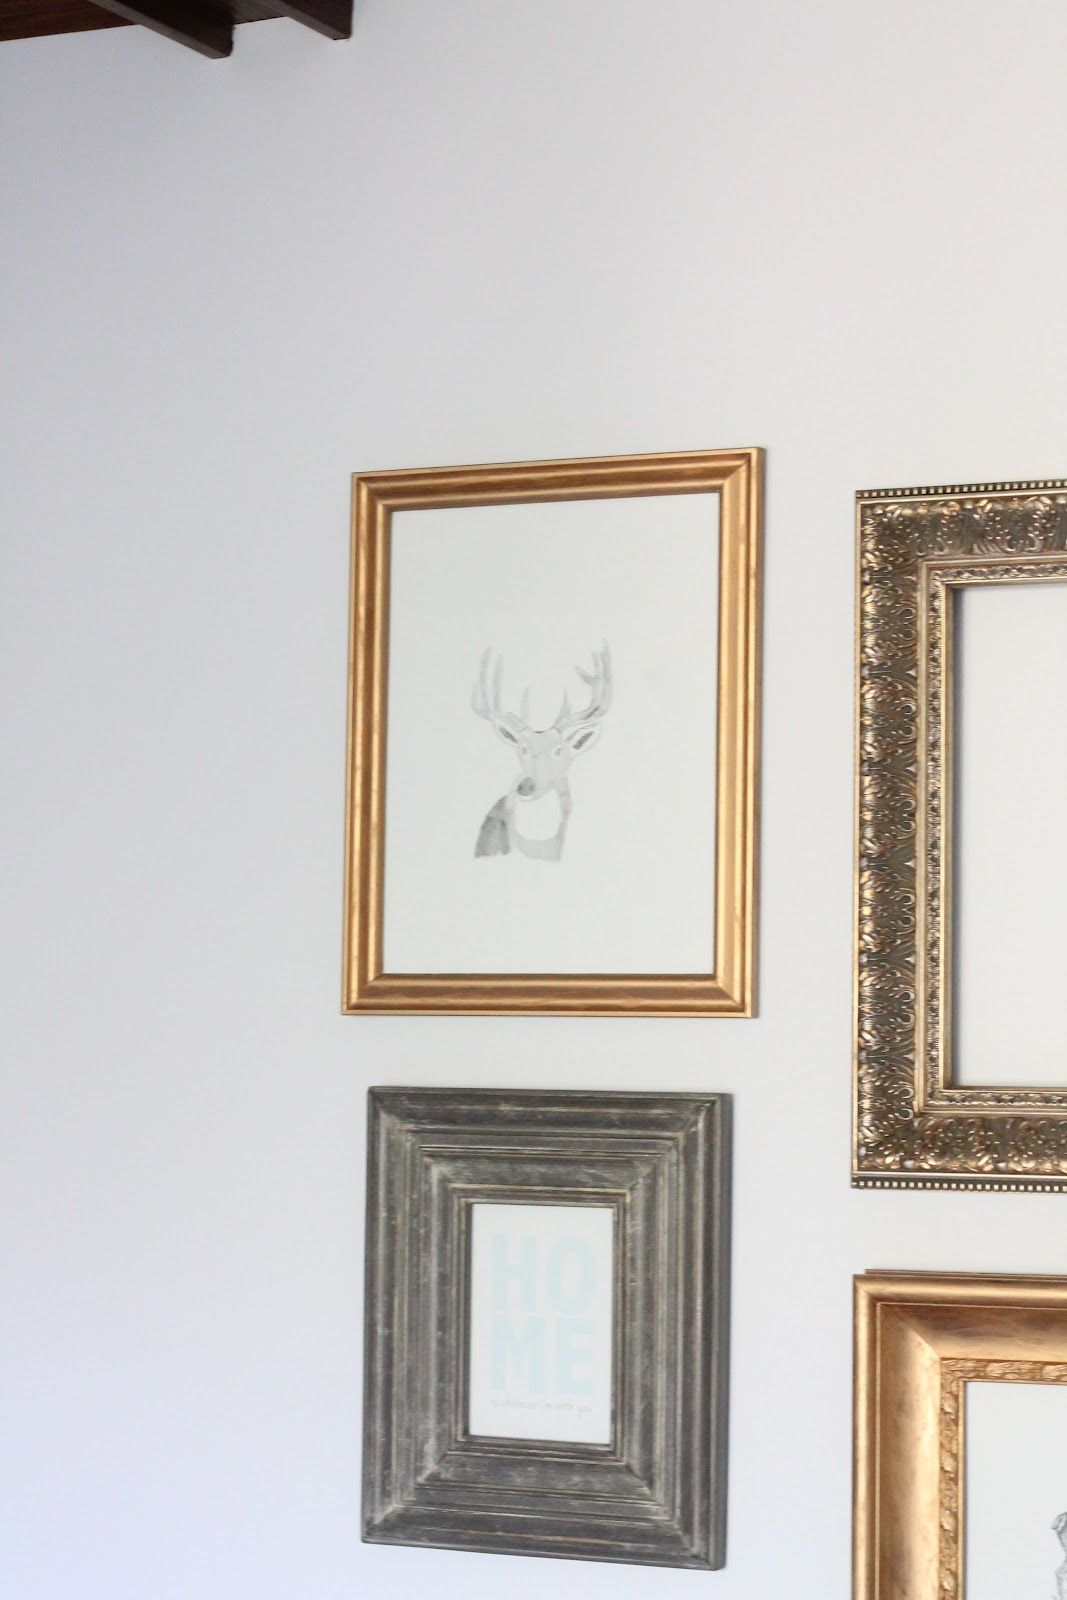 Increíble Bricolaje Marcos Baratos Composición - Ideas de Arte ...